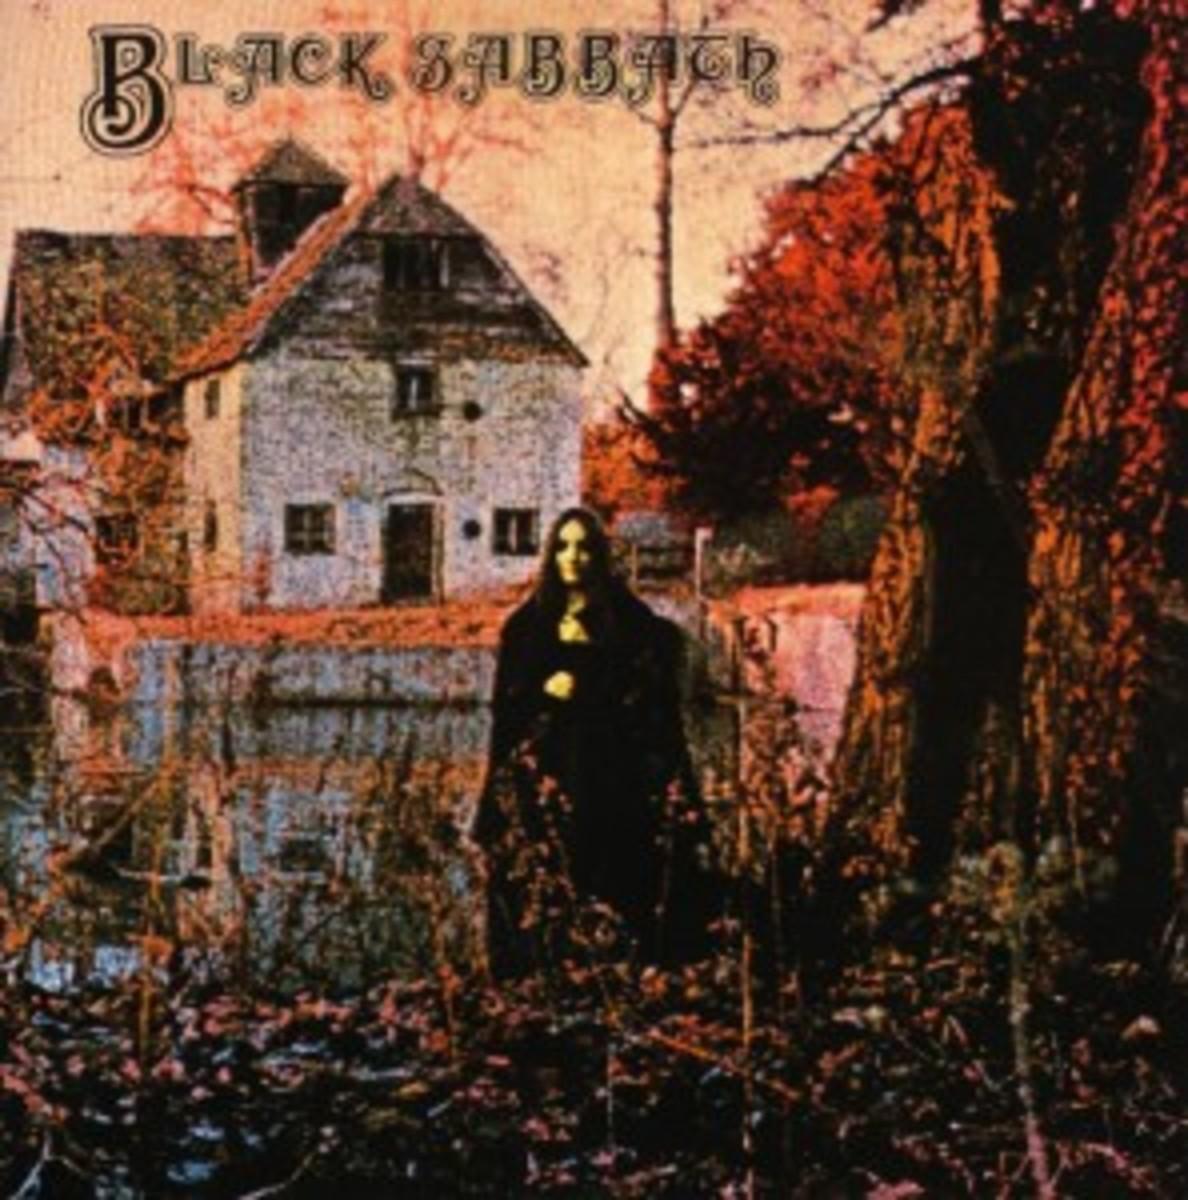 Black Sabbath_Black Sabbath